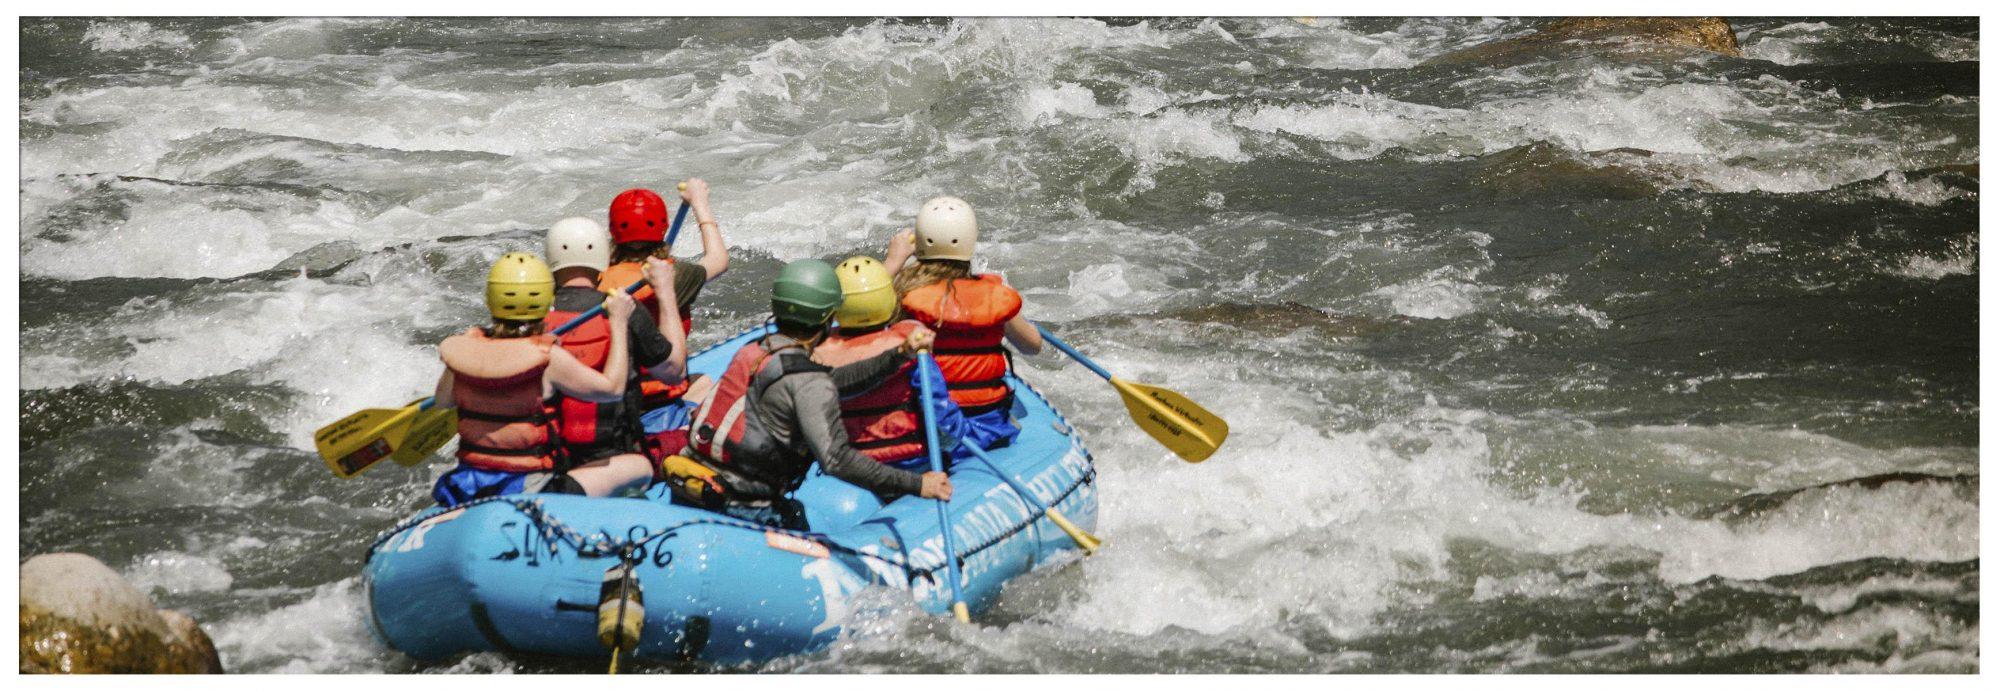 HA rafting 2 c